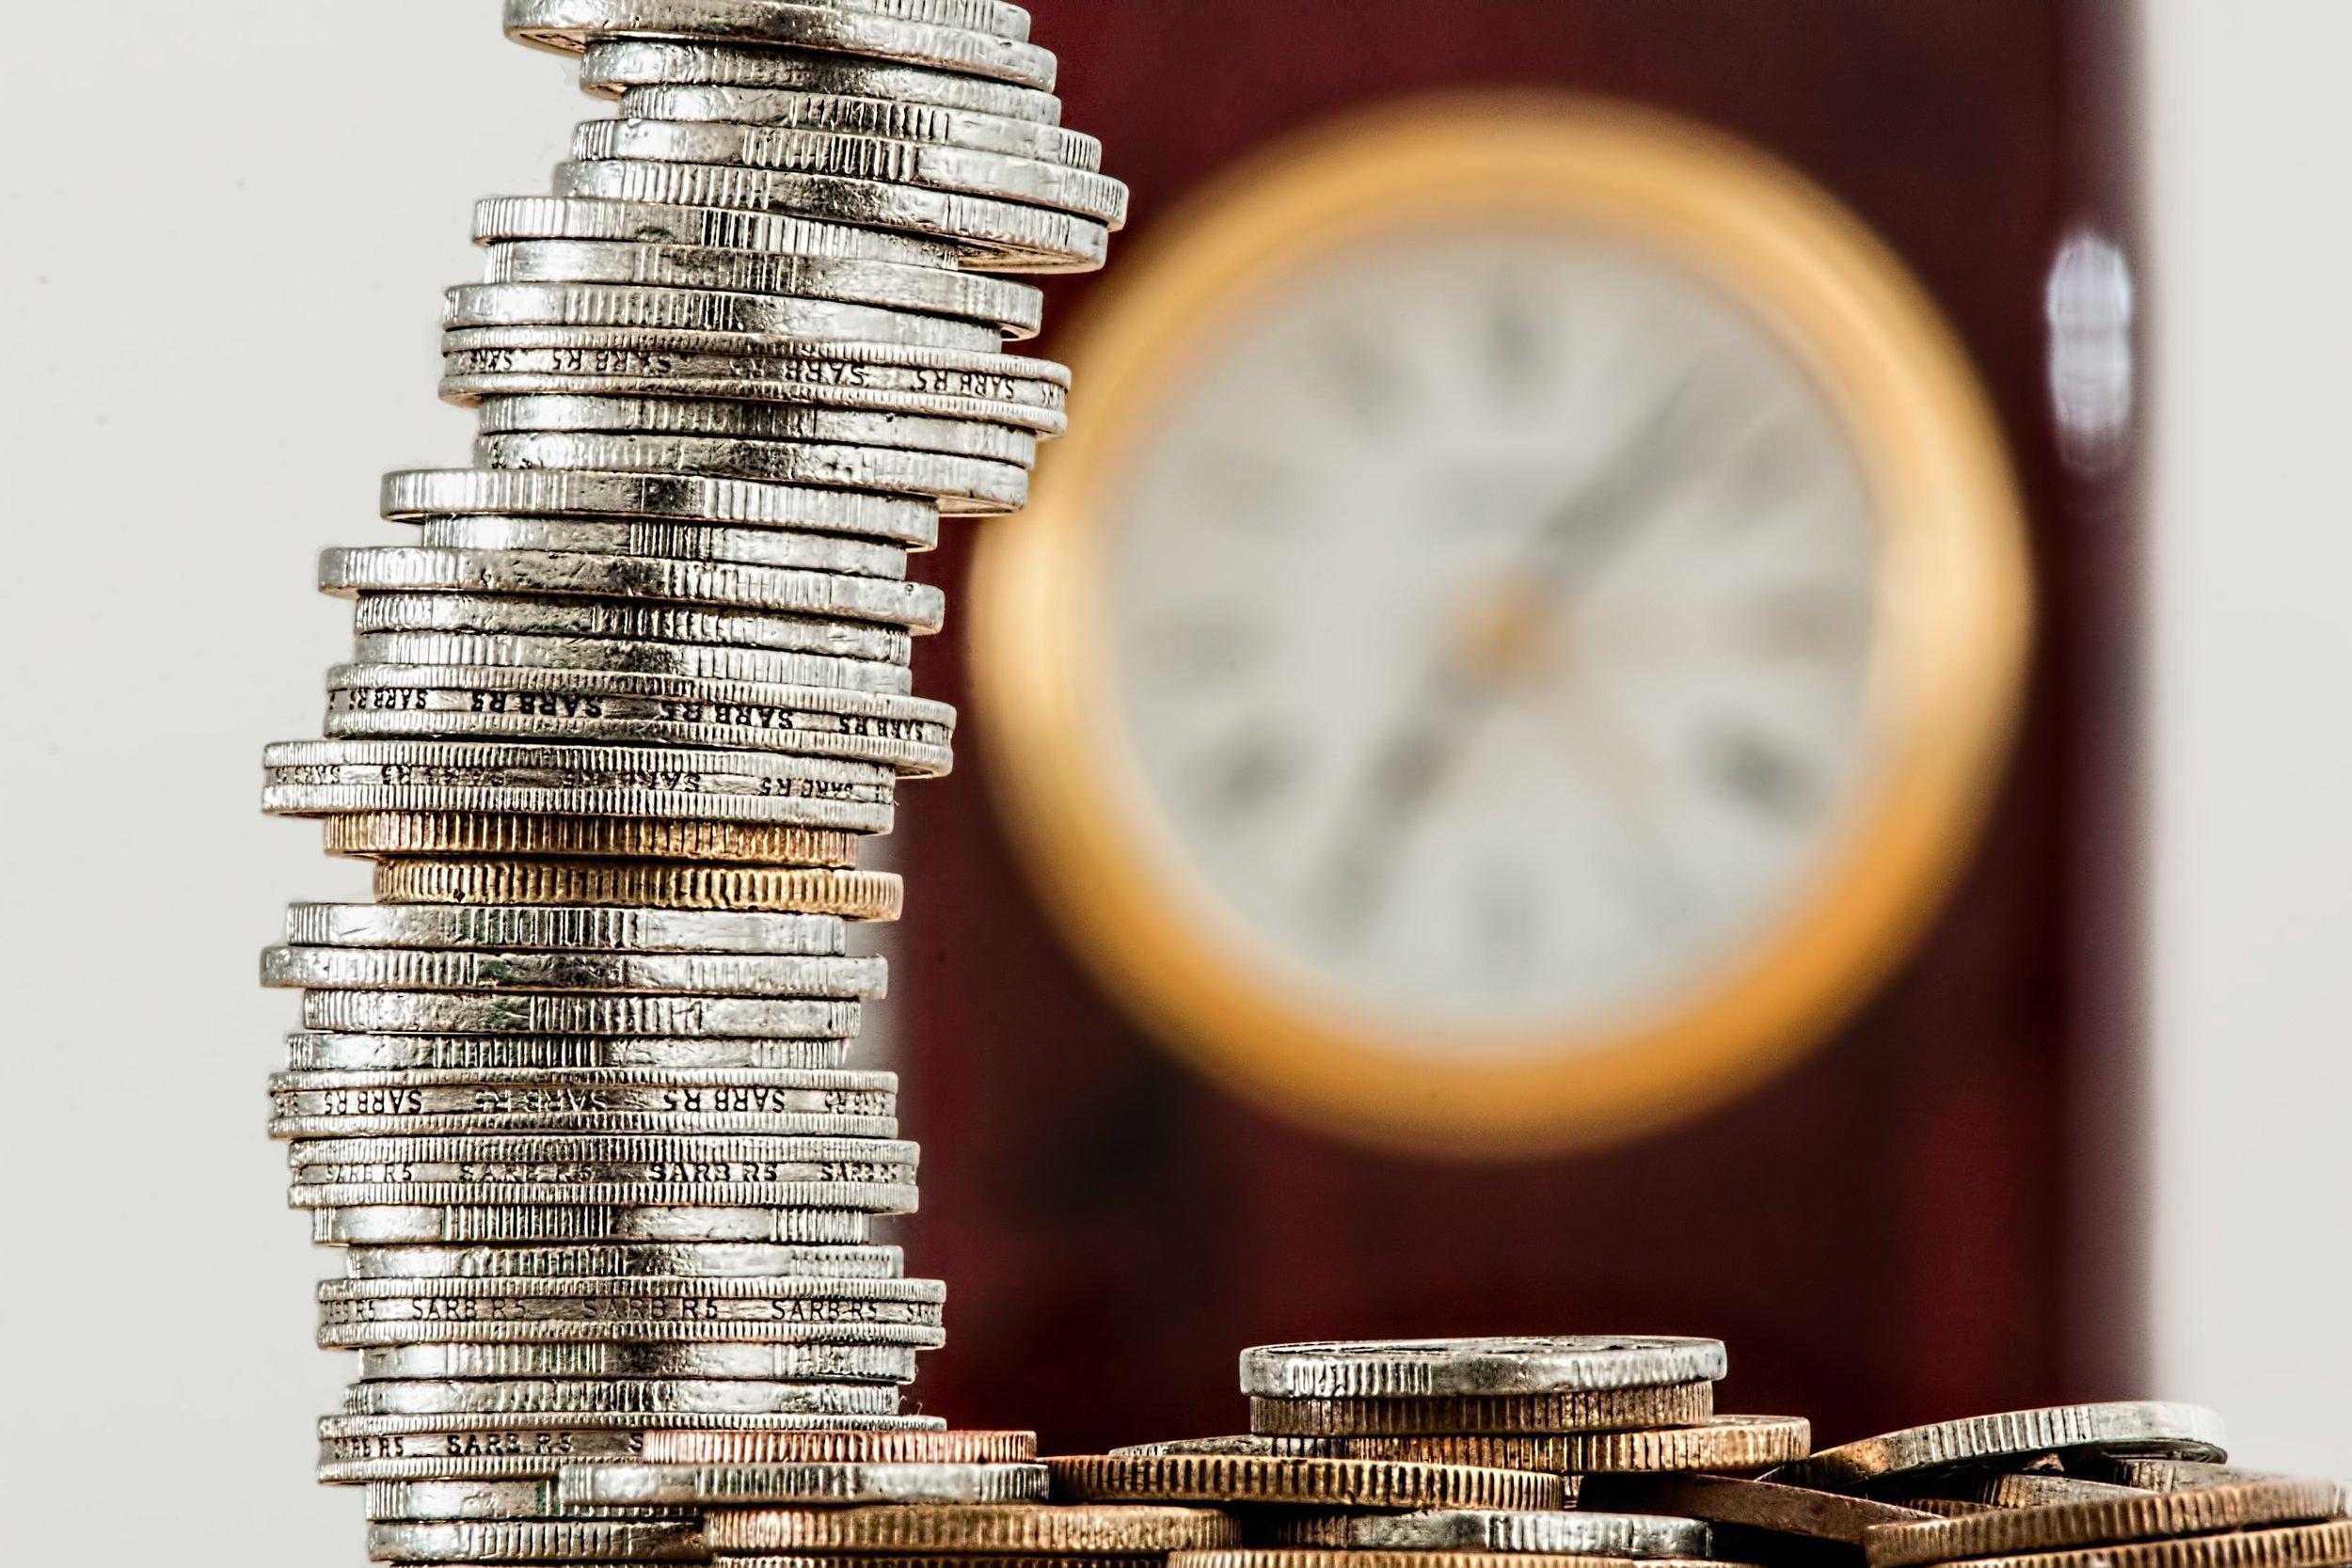 accounting-blur-budget-128867 copy.jpg